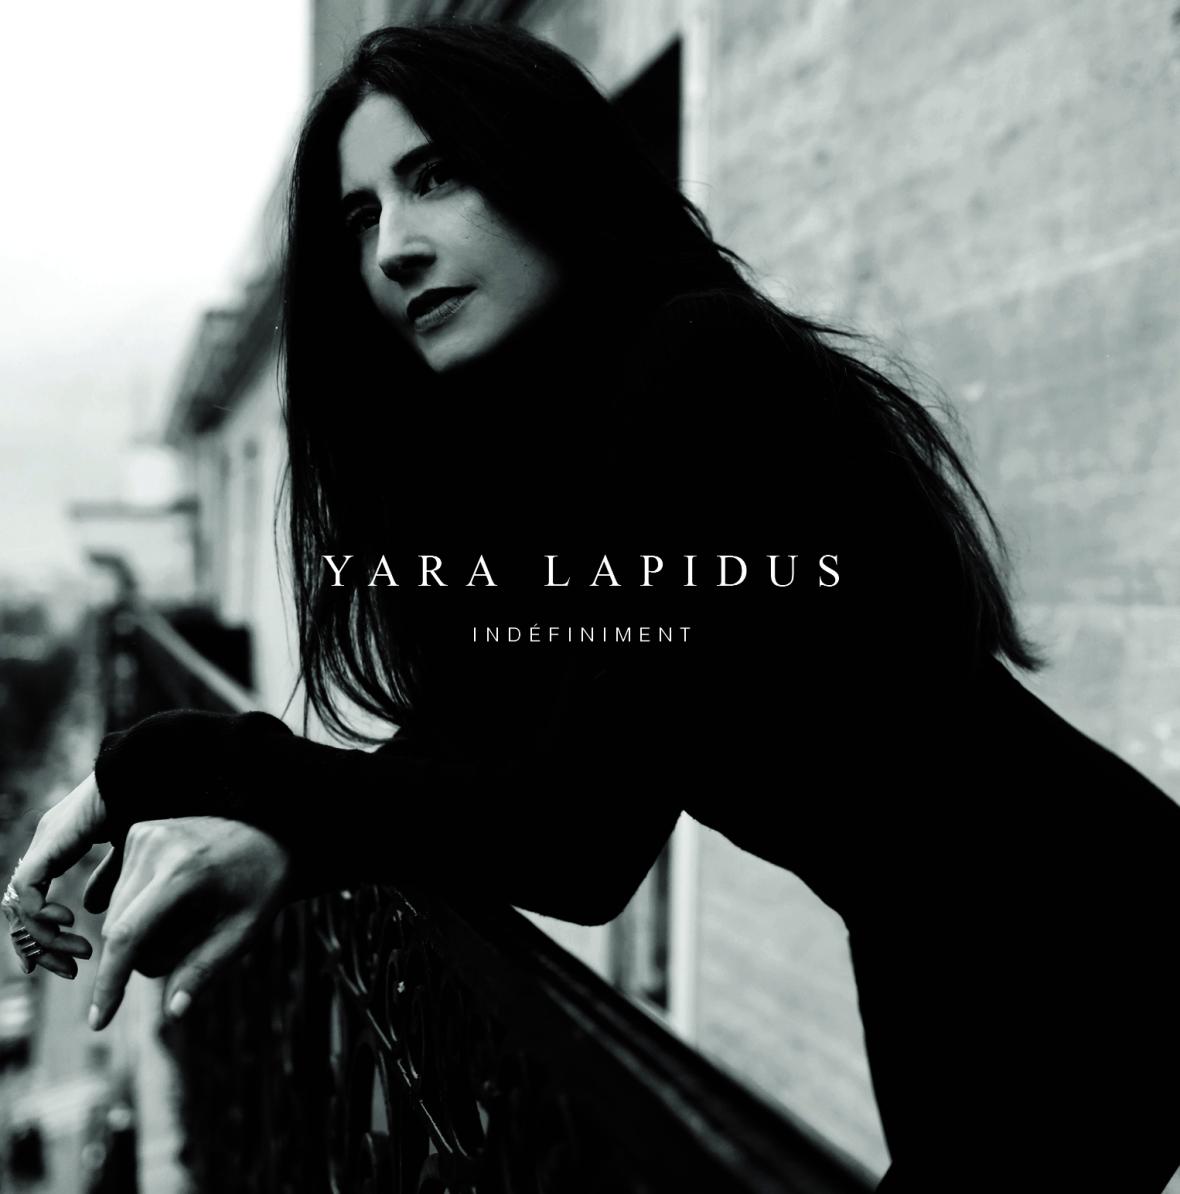 Yara Lapidus, Indéfiniment